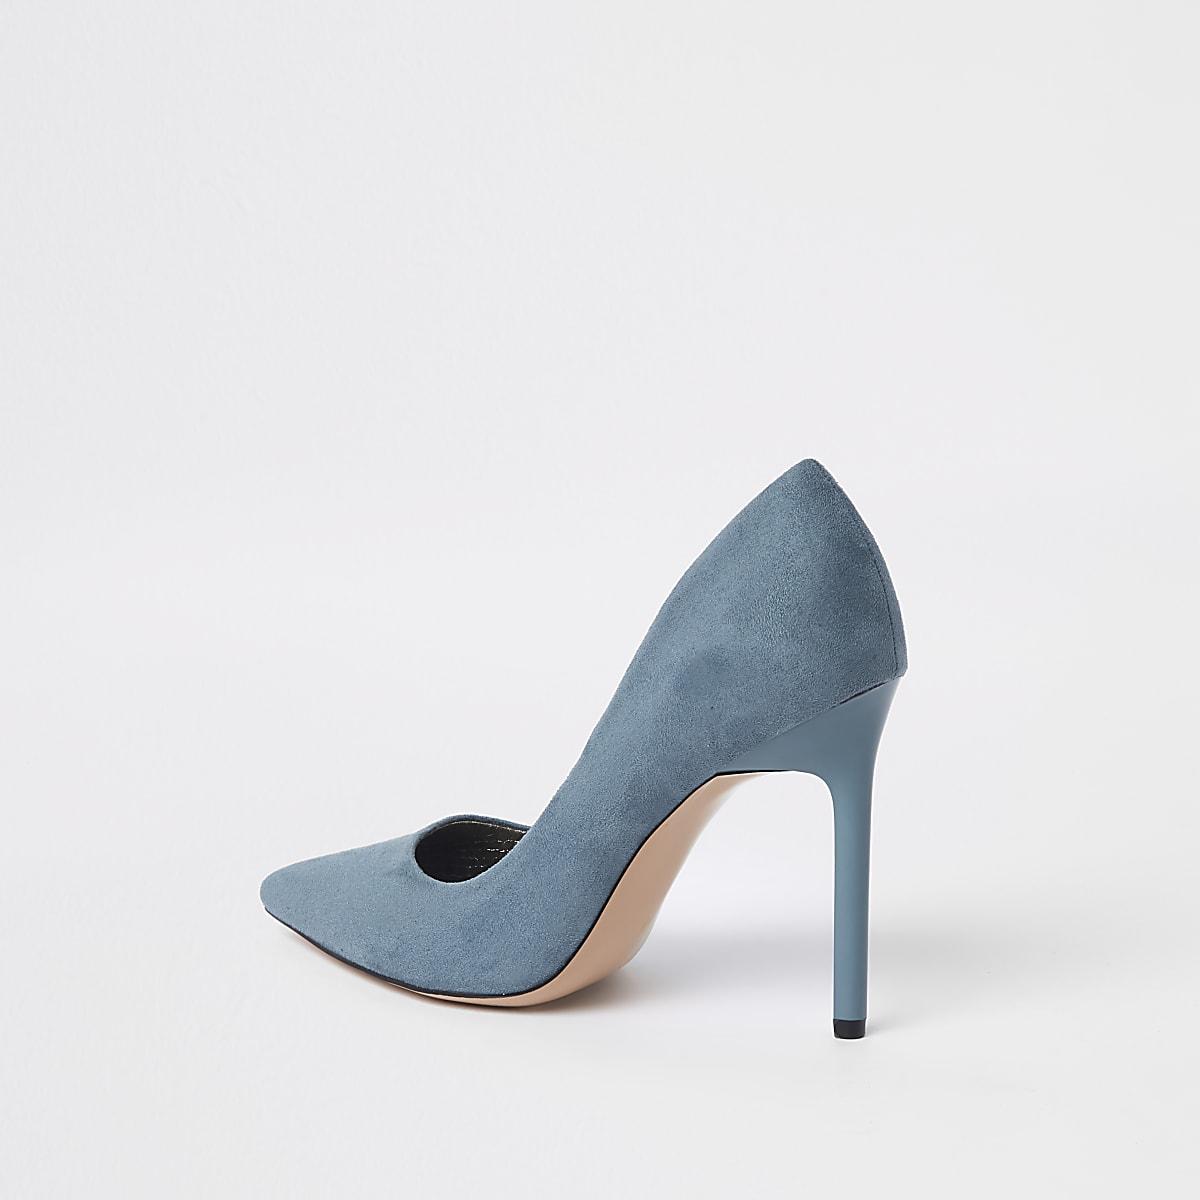 8e76e64fc8151b Blaue Pumps aus Wildlederimitat - Schuhe - Schuhe   Stiefel - Damen